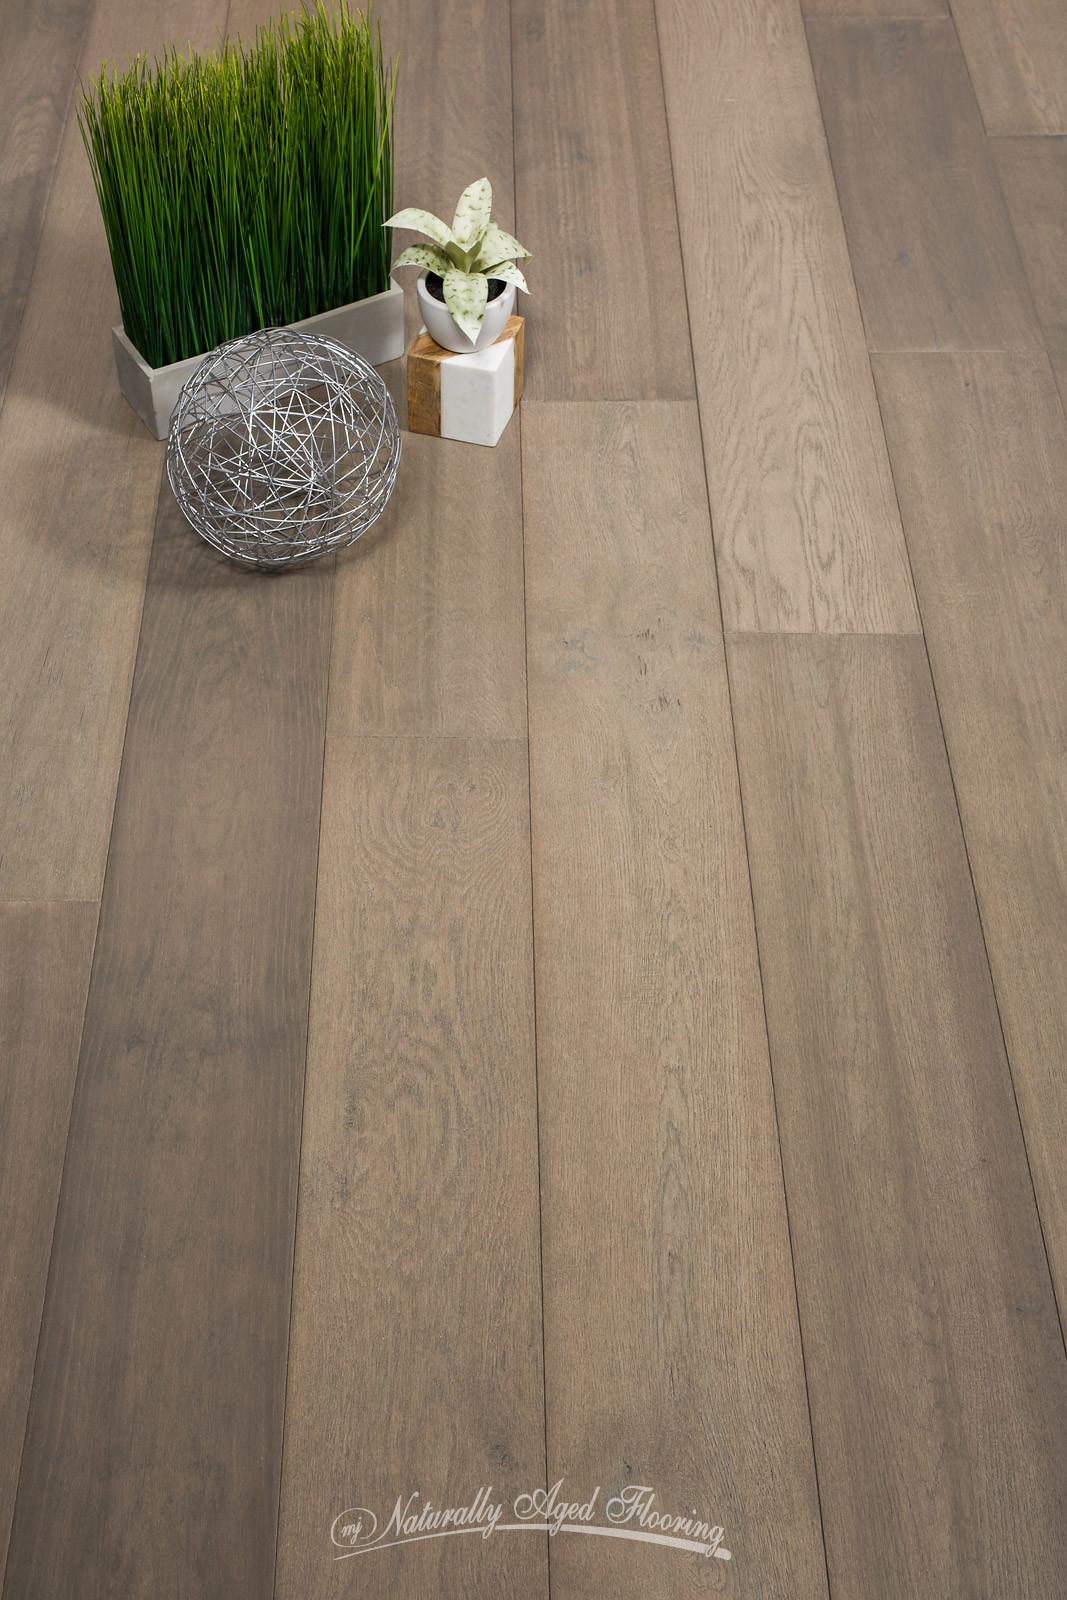 Graphite Grey Naturally Aged Flooring